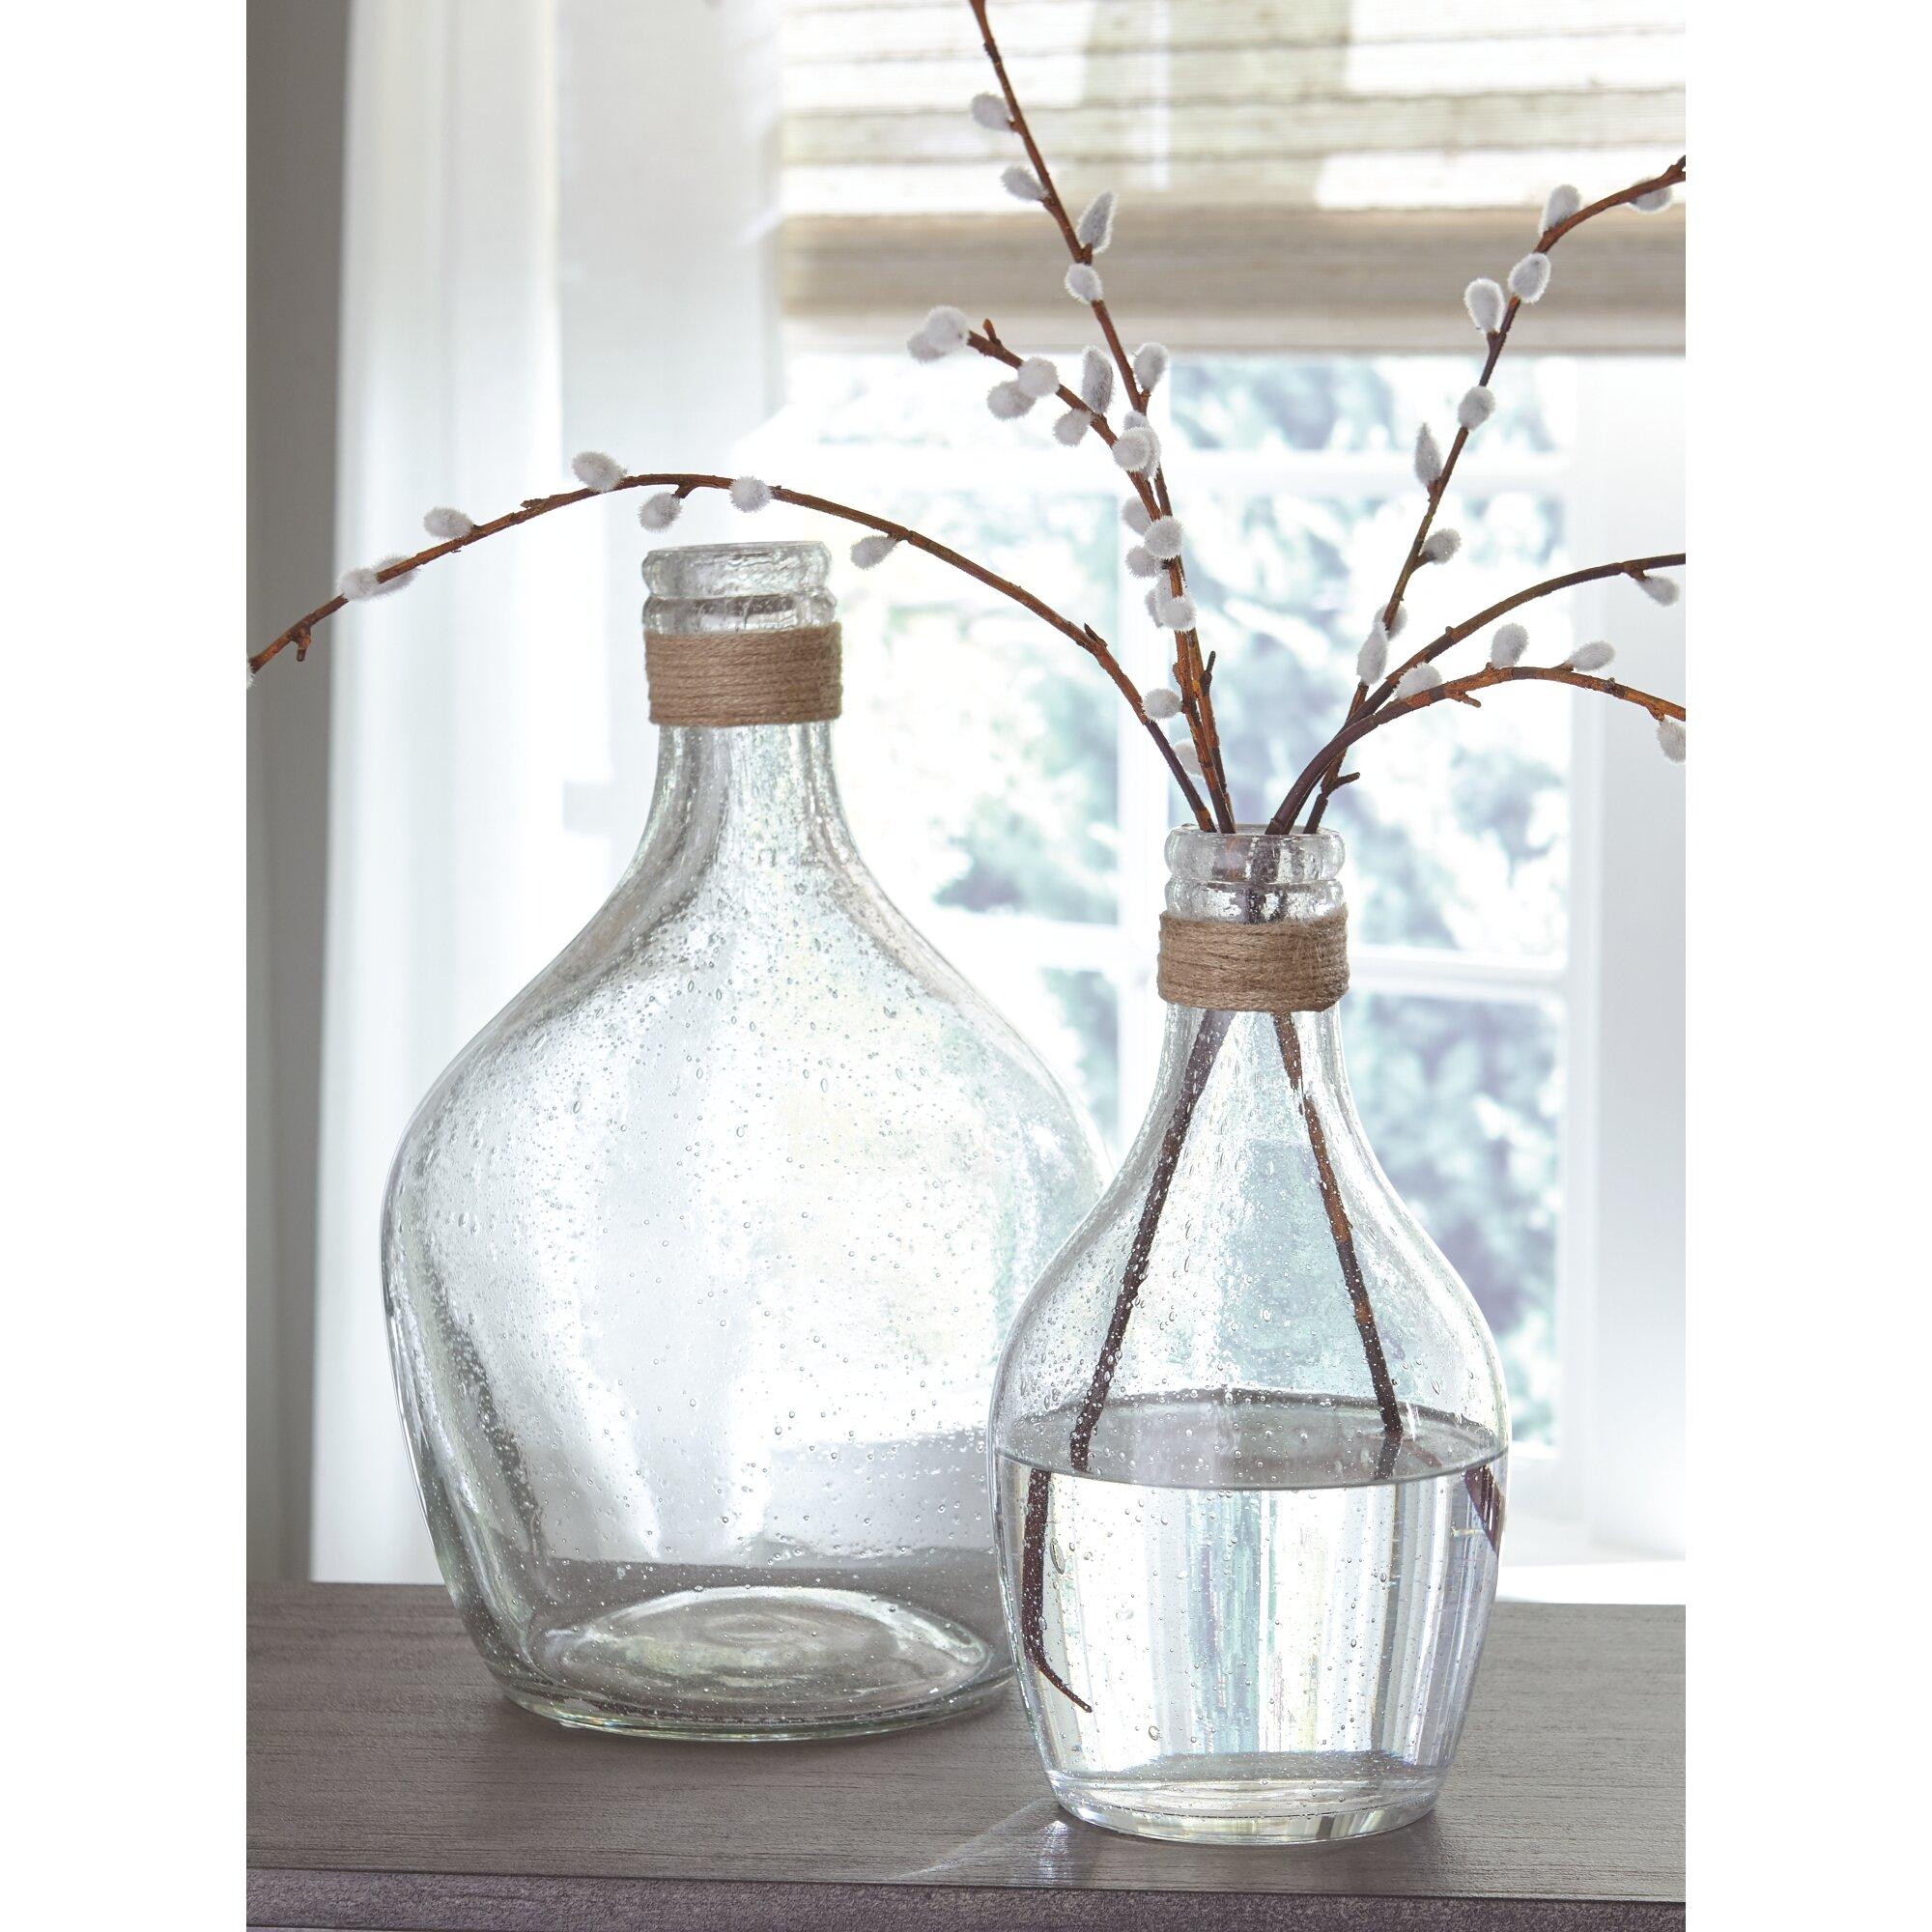 Watertight Vases Urns Jars Bottles You Ll Love In 2021 Wayfair